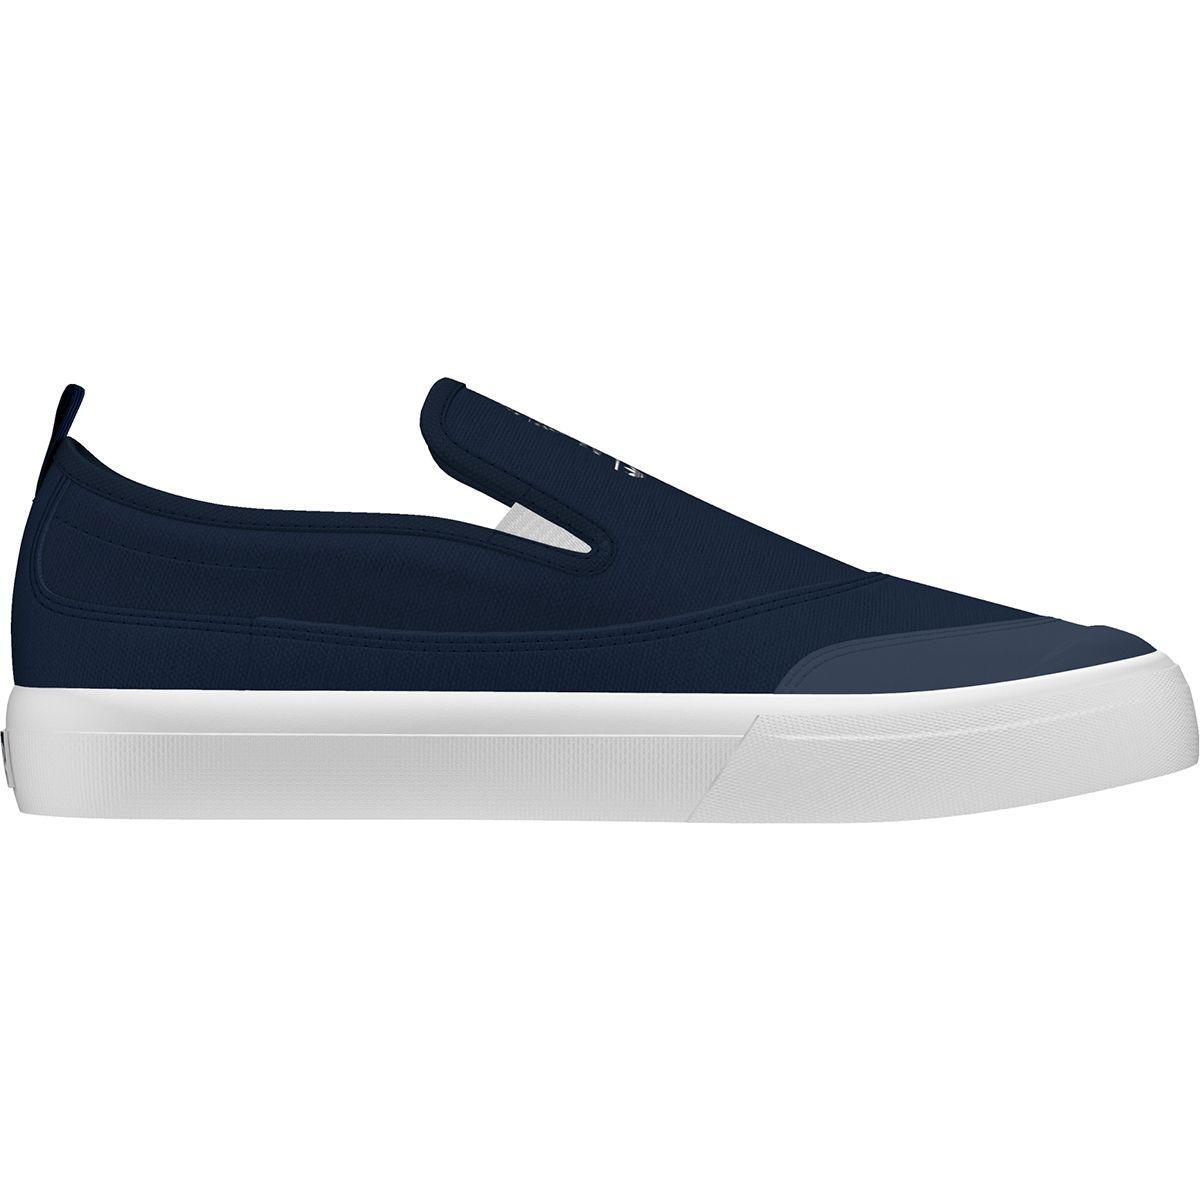 Matchcourt Slip Lyst Adidas zapato en color azul para hombres